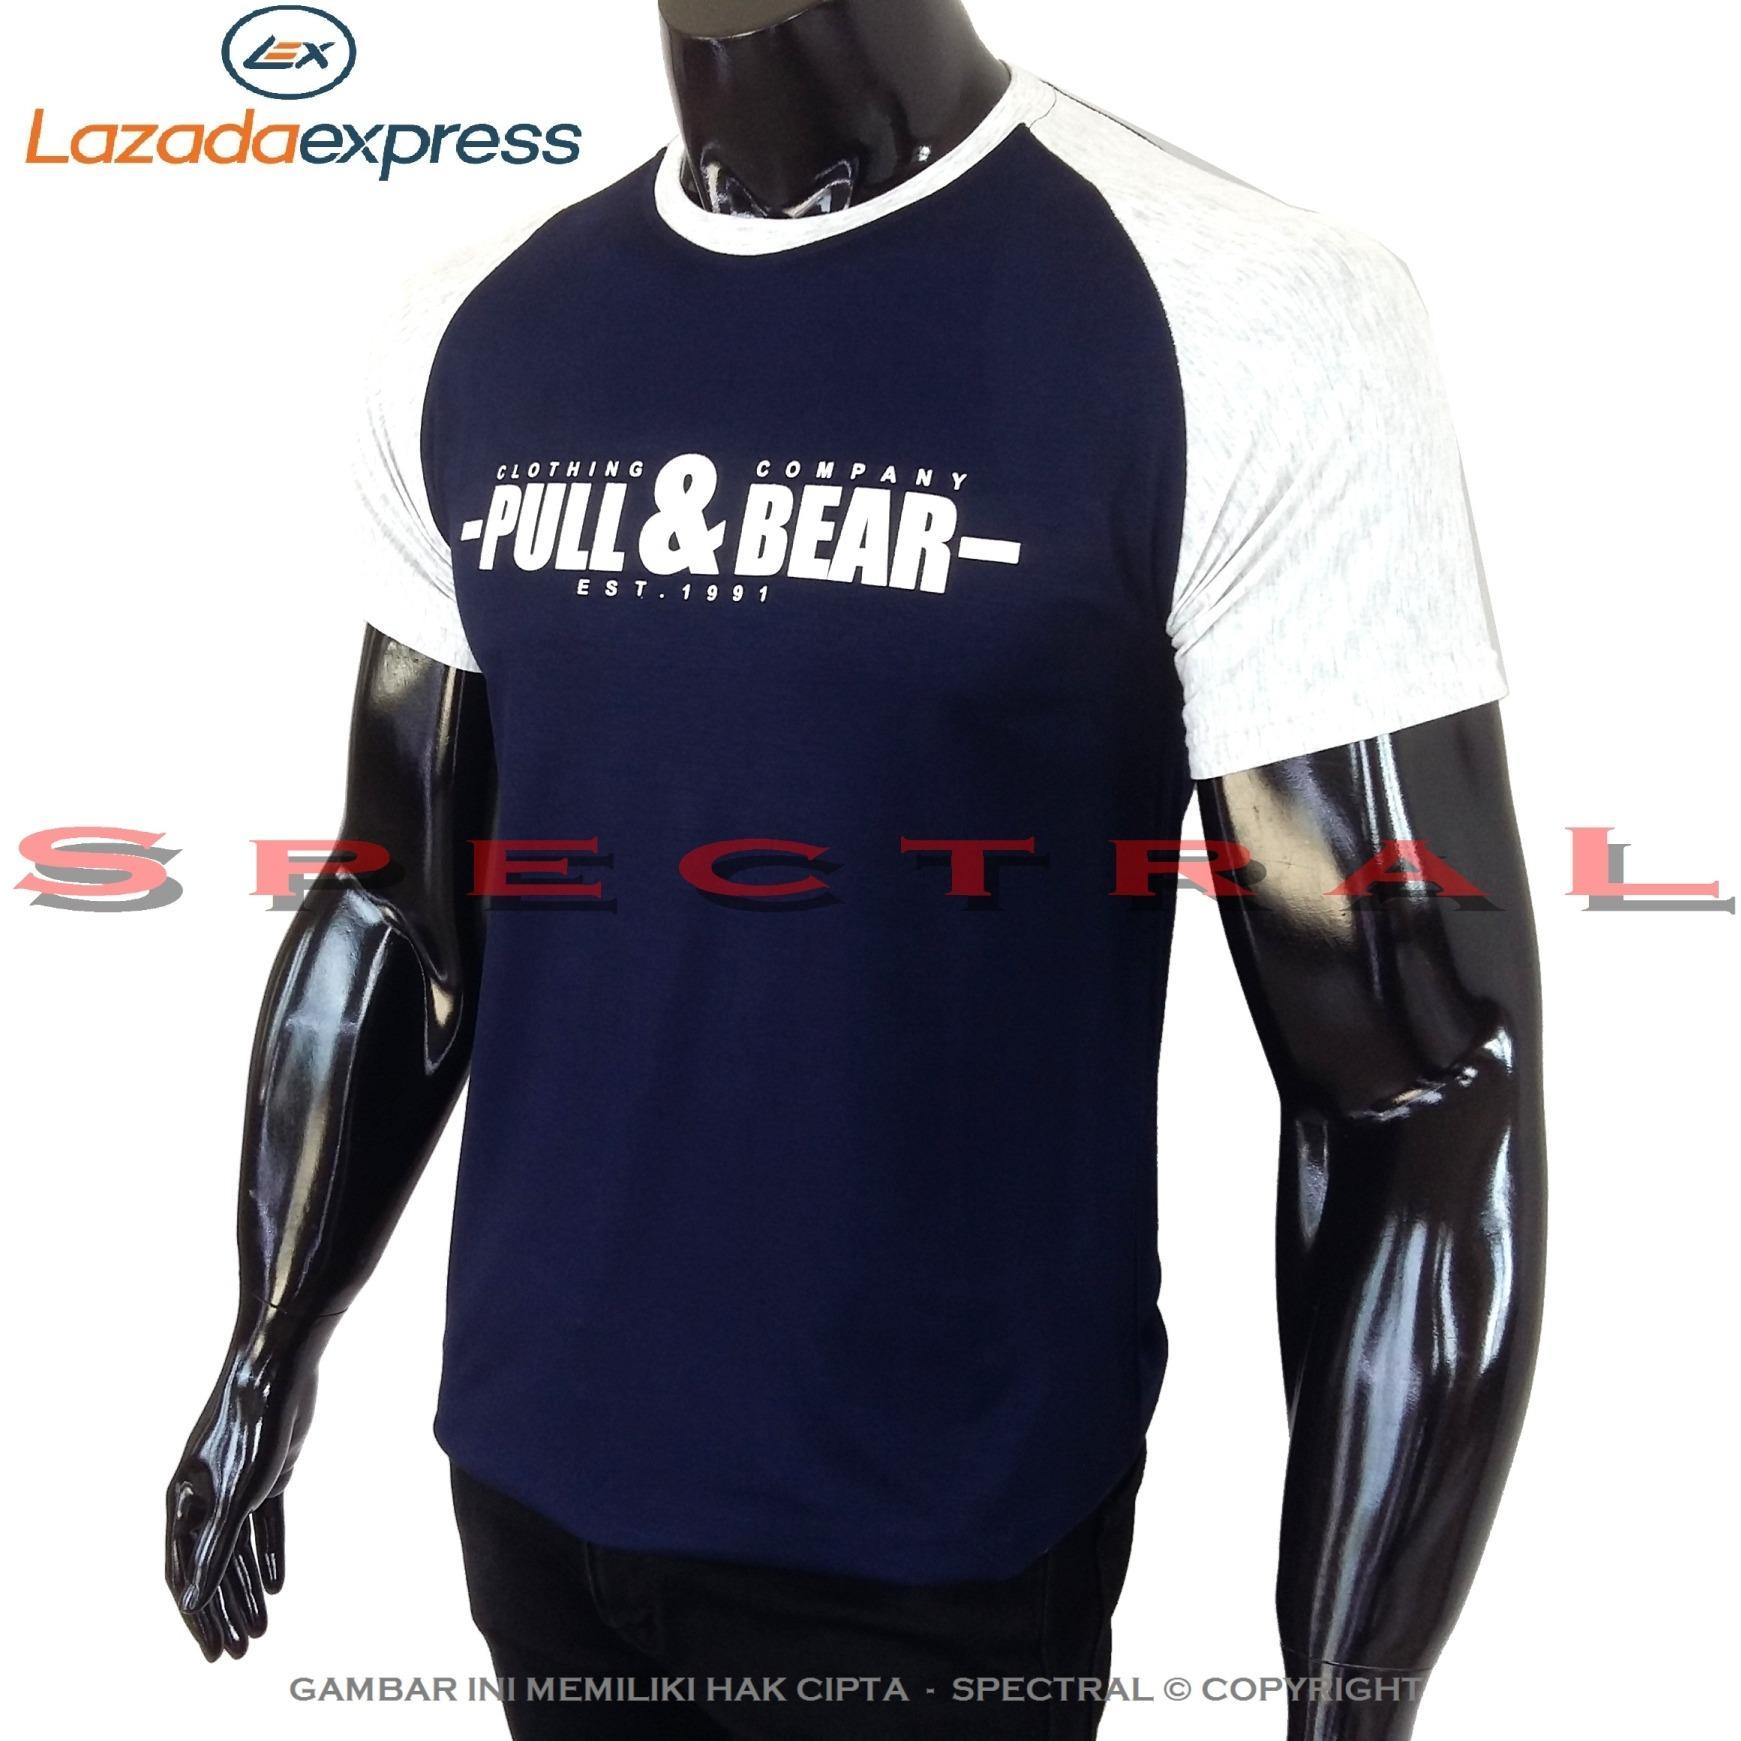 Spectral – RAGLAN PULL & BEAR M Fit To L Soft Rayon Lycra Viscose Kaos Distro Fashion T-Shirt Atasan Baju Pakaian Polos Shirt Pria Wanita Cewe Cowo  Lengan Murah Bagus Keren Jaman Kekinian Jakarta Bandung Tumblr Gambar Merek Tulisan Reglan Kombinasi